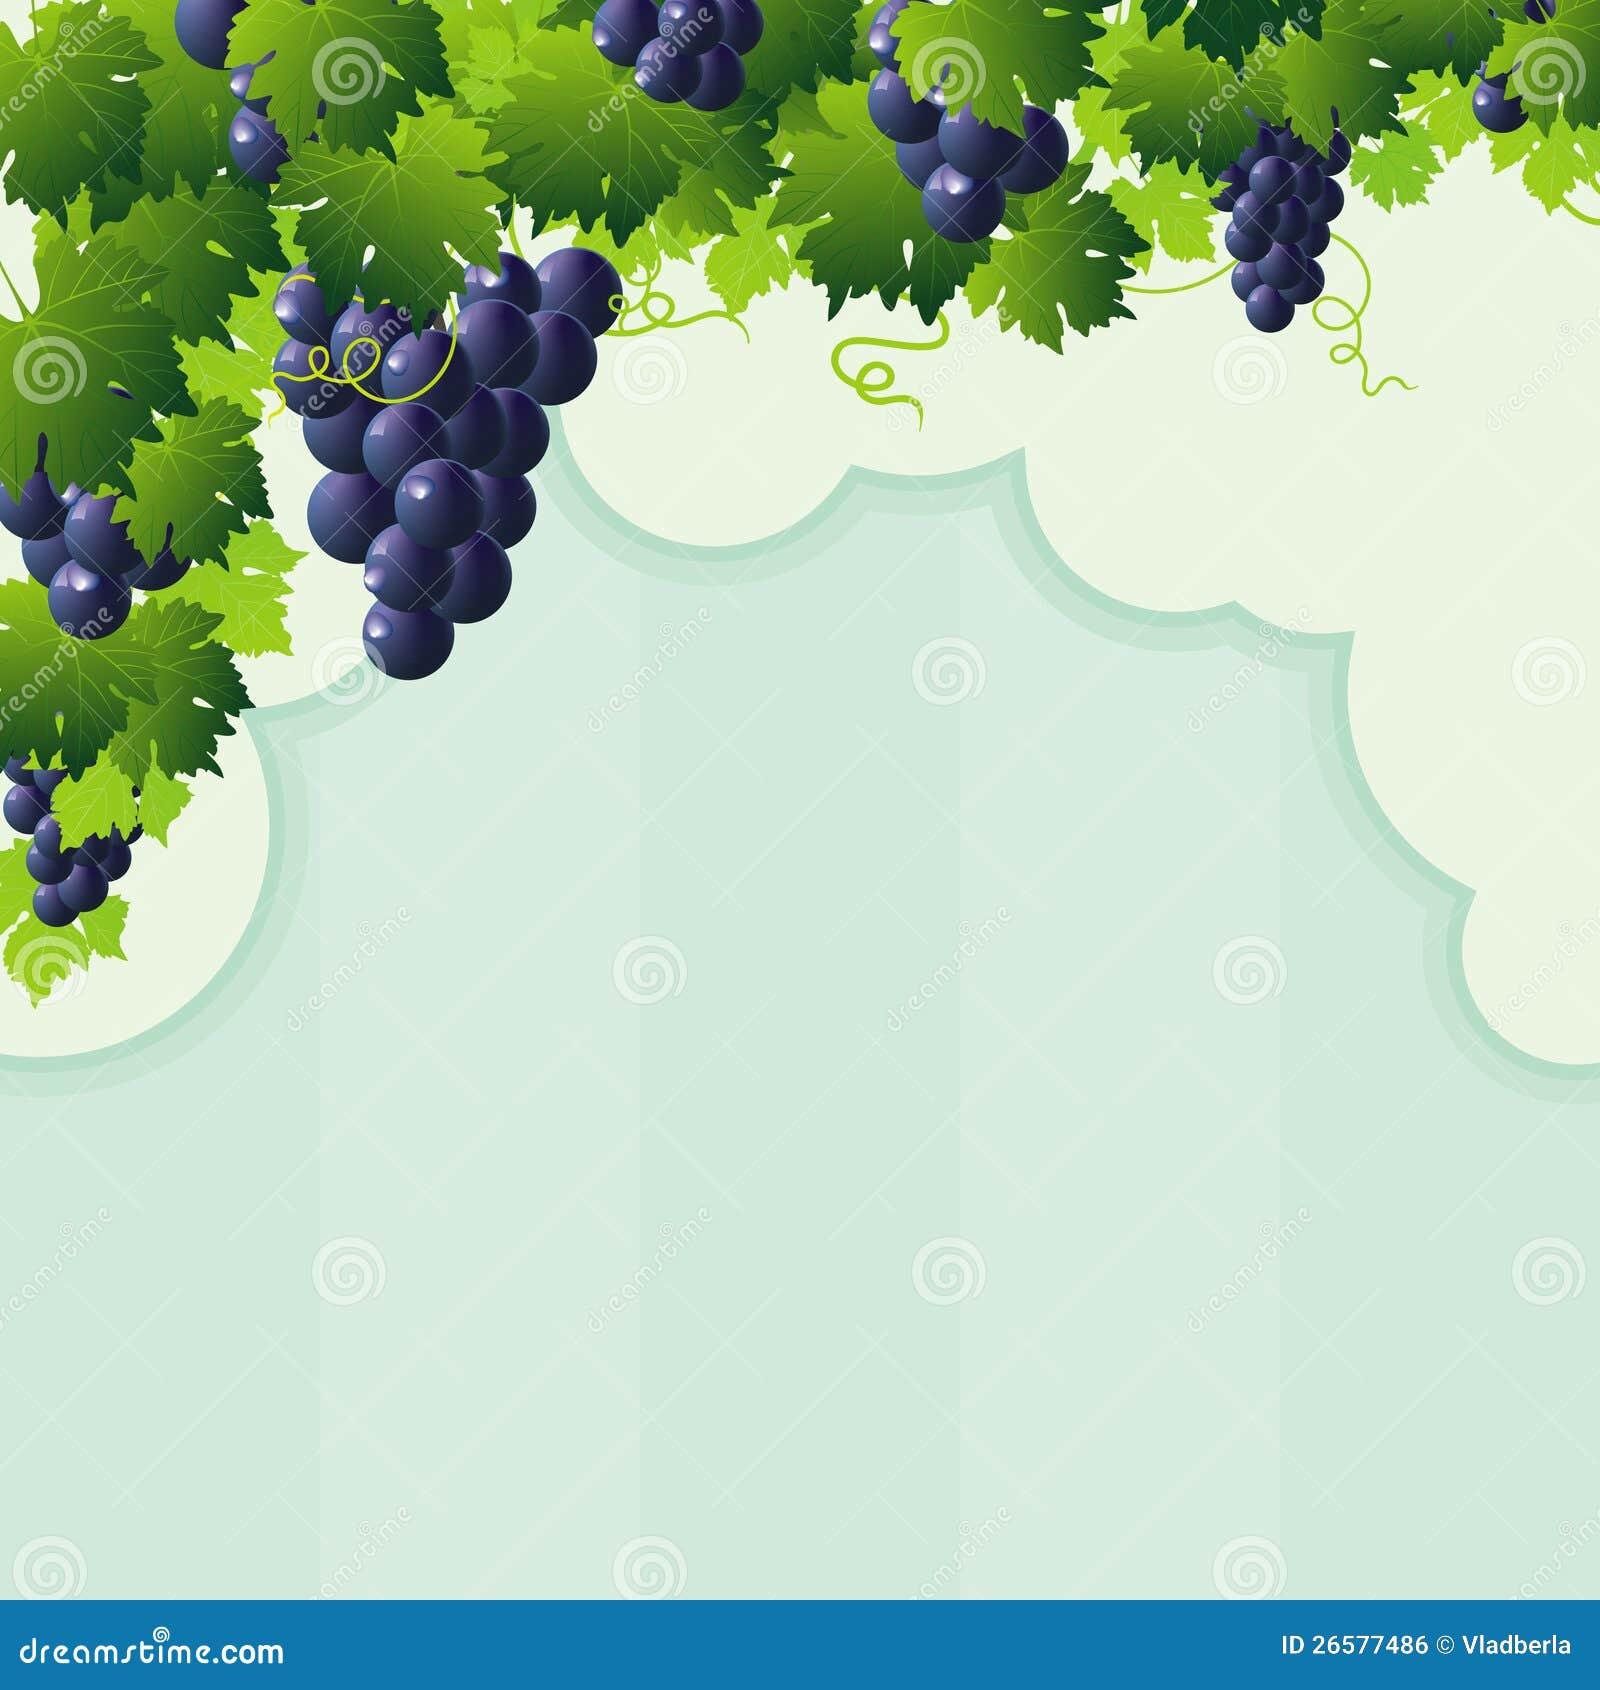 Blue Vine Grape Cutout Frame Royalty Free Stock Image - Image ... Flower Vine Clipart